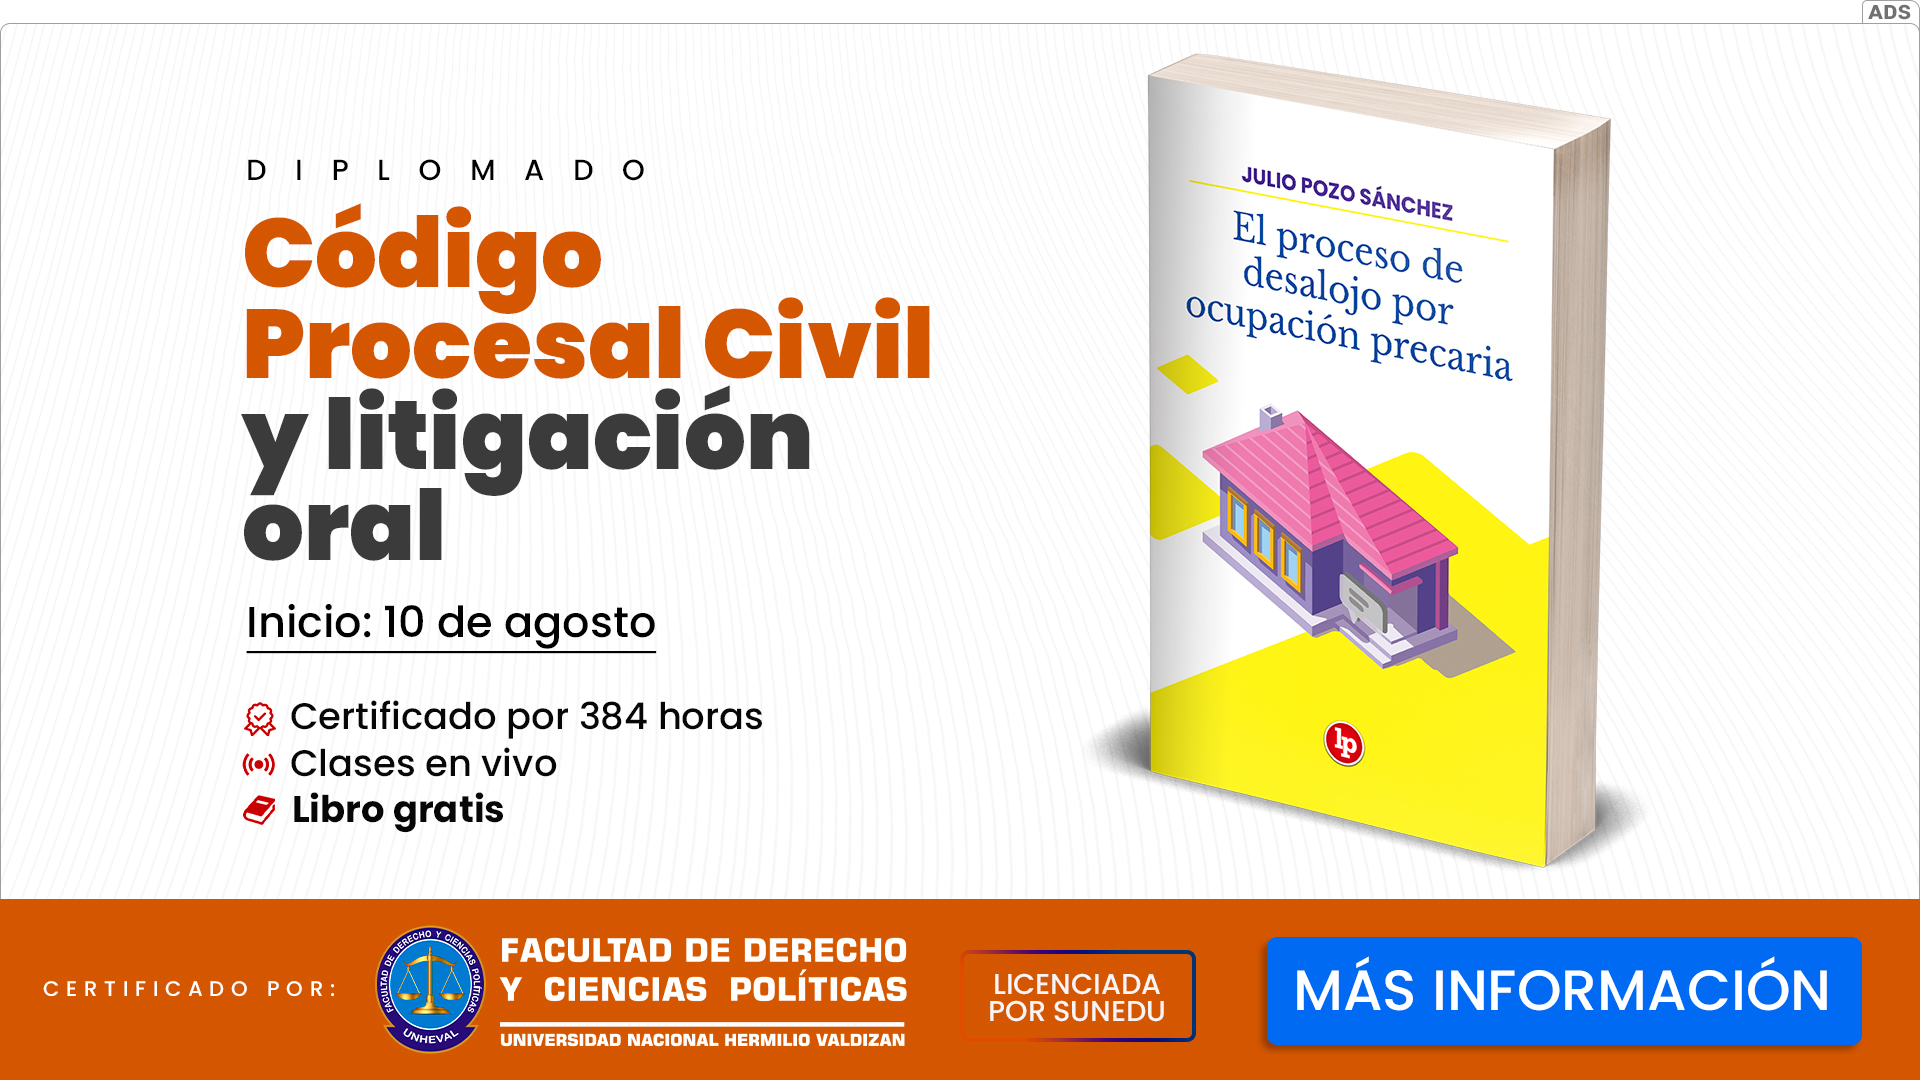 art-interior-inicio-10-agosto-codigo-procesal-civil-litigacion-oral